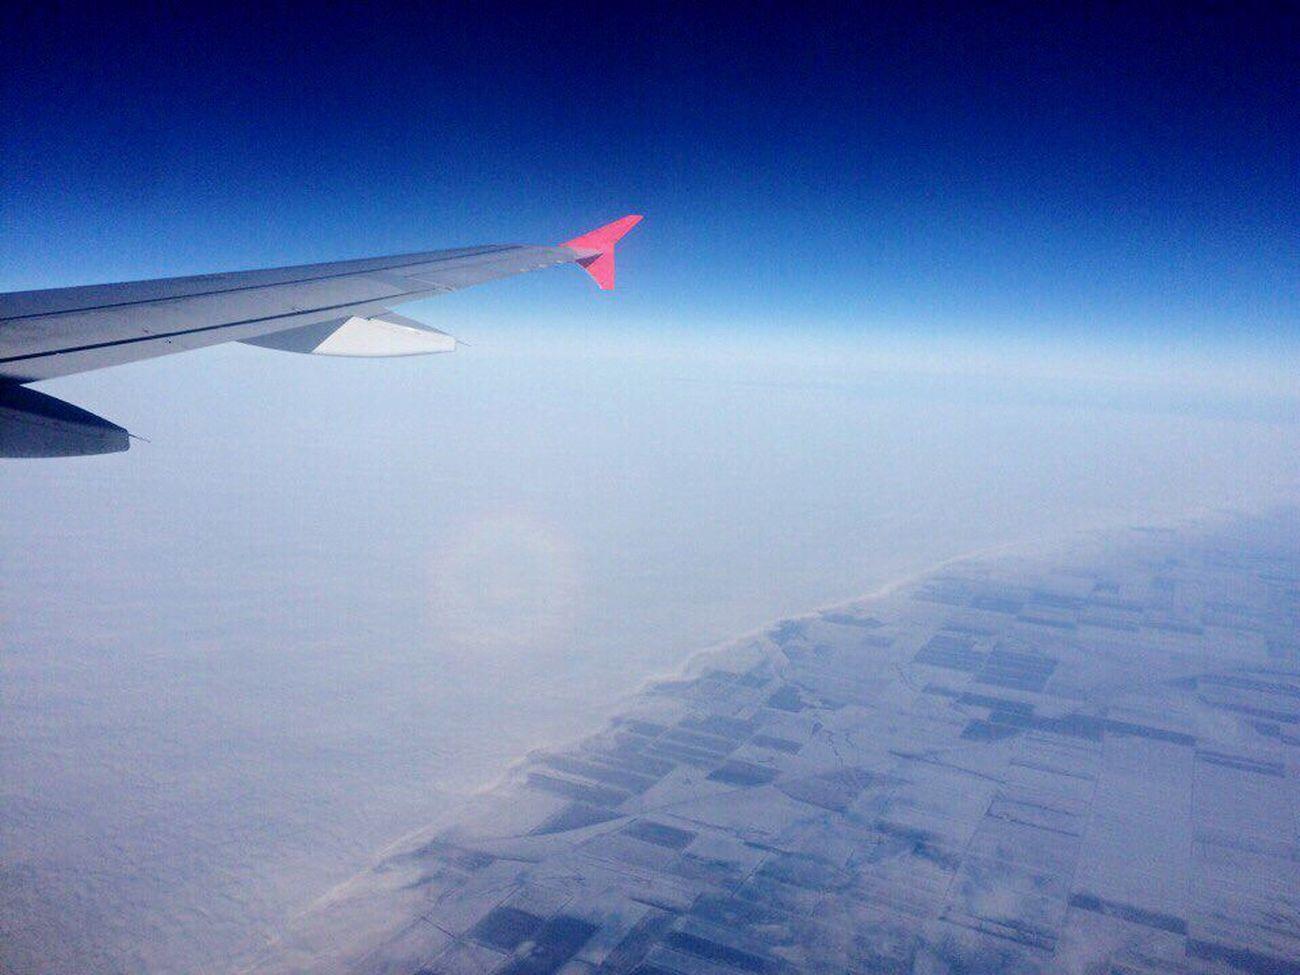 Sky Ural Airlines Fly Travel Russia Plain Dombay Karachaevo Circassia небо Уральские авиалинии Полет путешествие Россия самолет домбай Карачаево-Черкессия зима